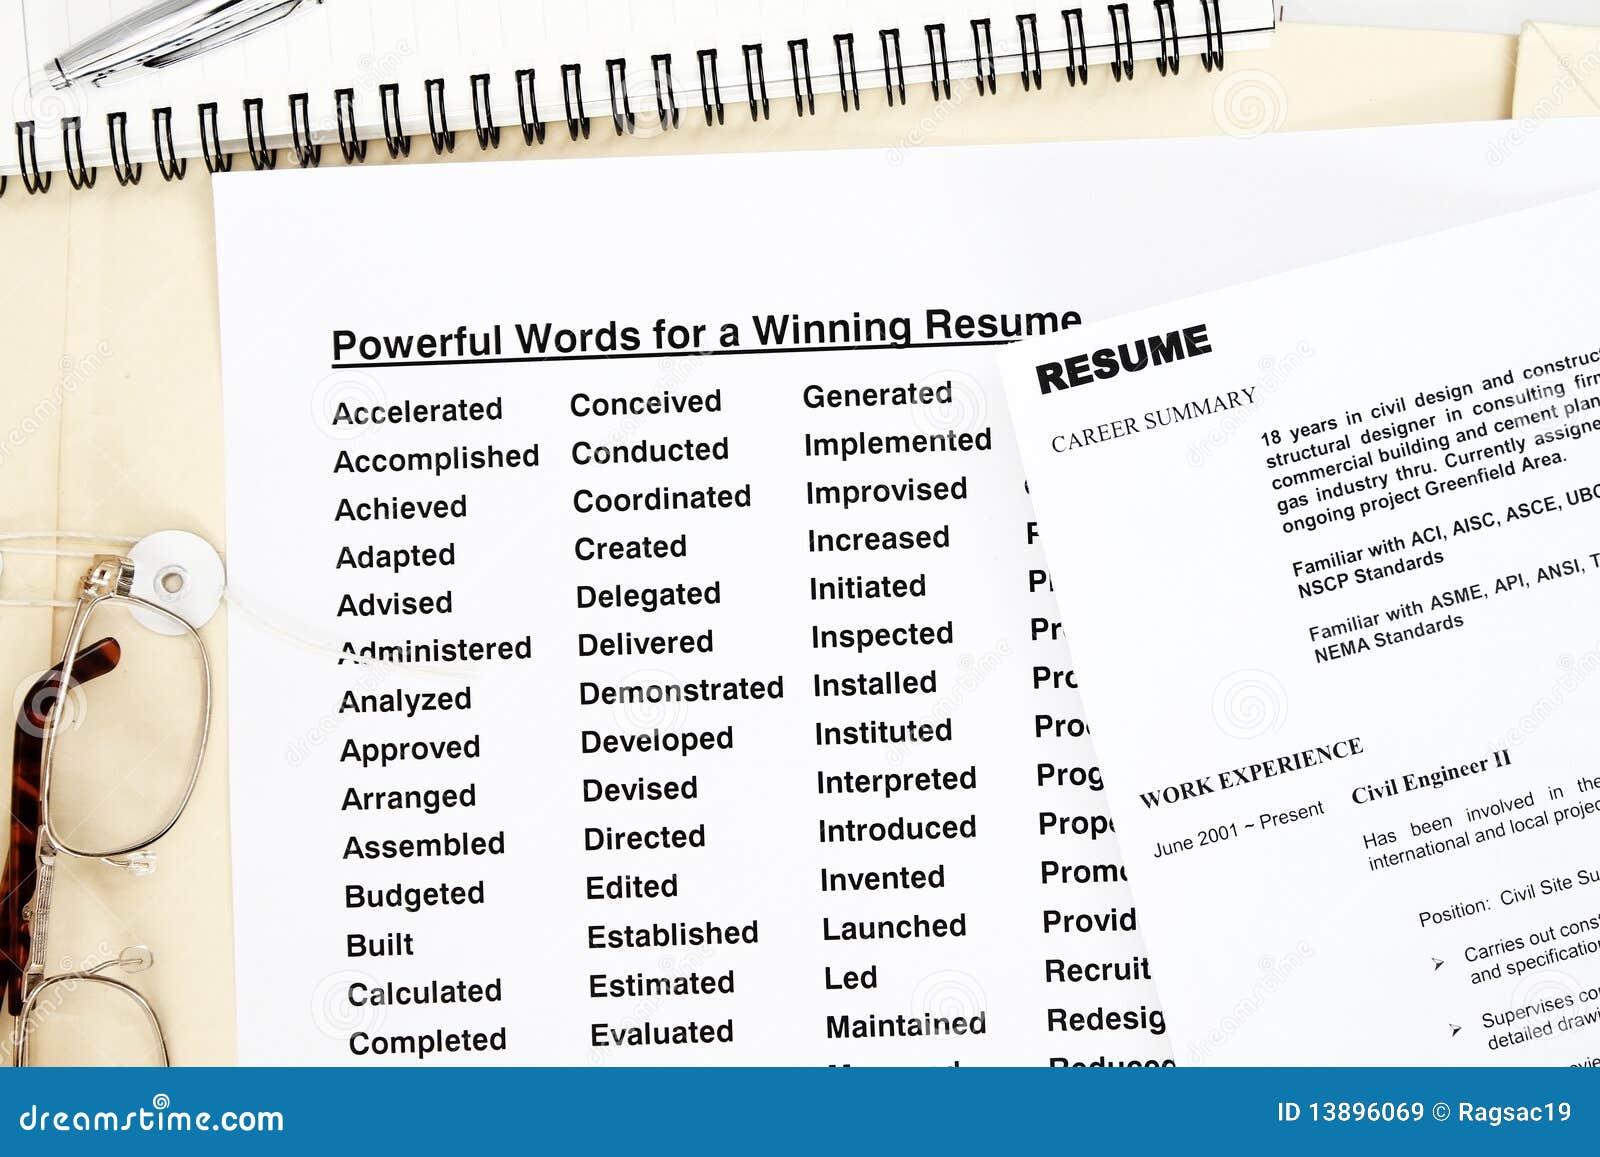 Powerful Words Resume Stock Image Image Of Close Human 13896069